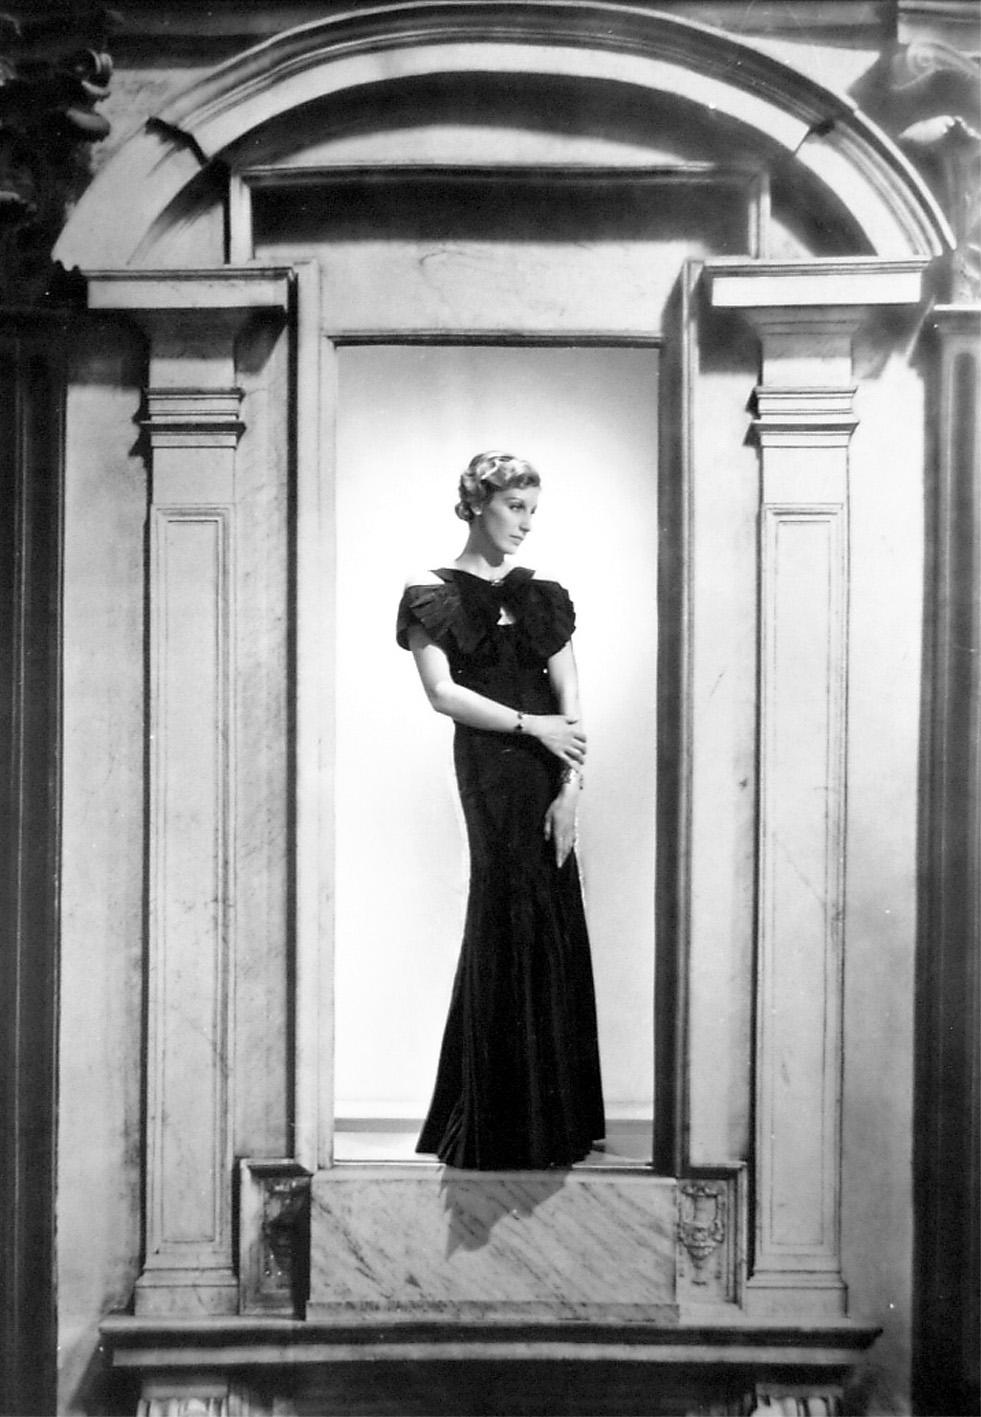 George Hoyningen-Huené, 1900 – 1968 Woman in Portico, Cahnel Fashion Ca. 1935 silver gelatin print Inv.-No.001383 House of Photography / F.C. Gundlach Collection, Hamburg  © Estate George Hoyningen-Huené